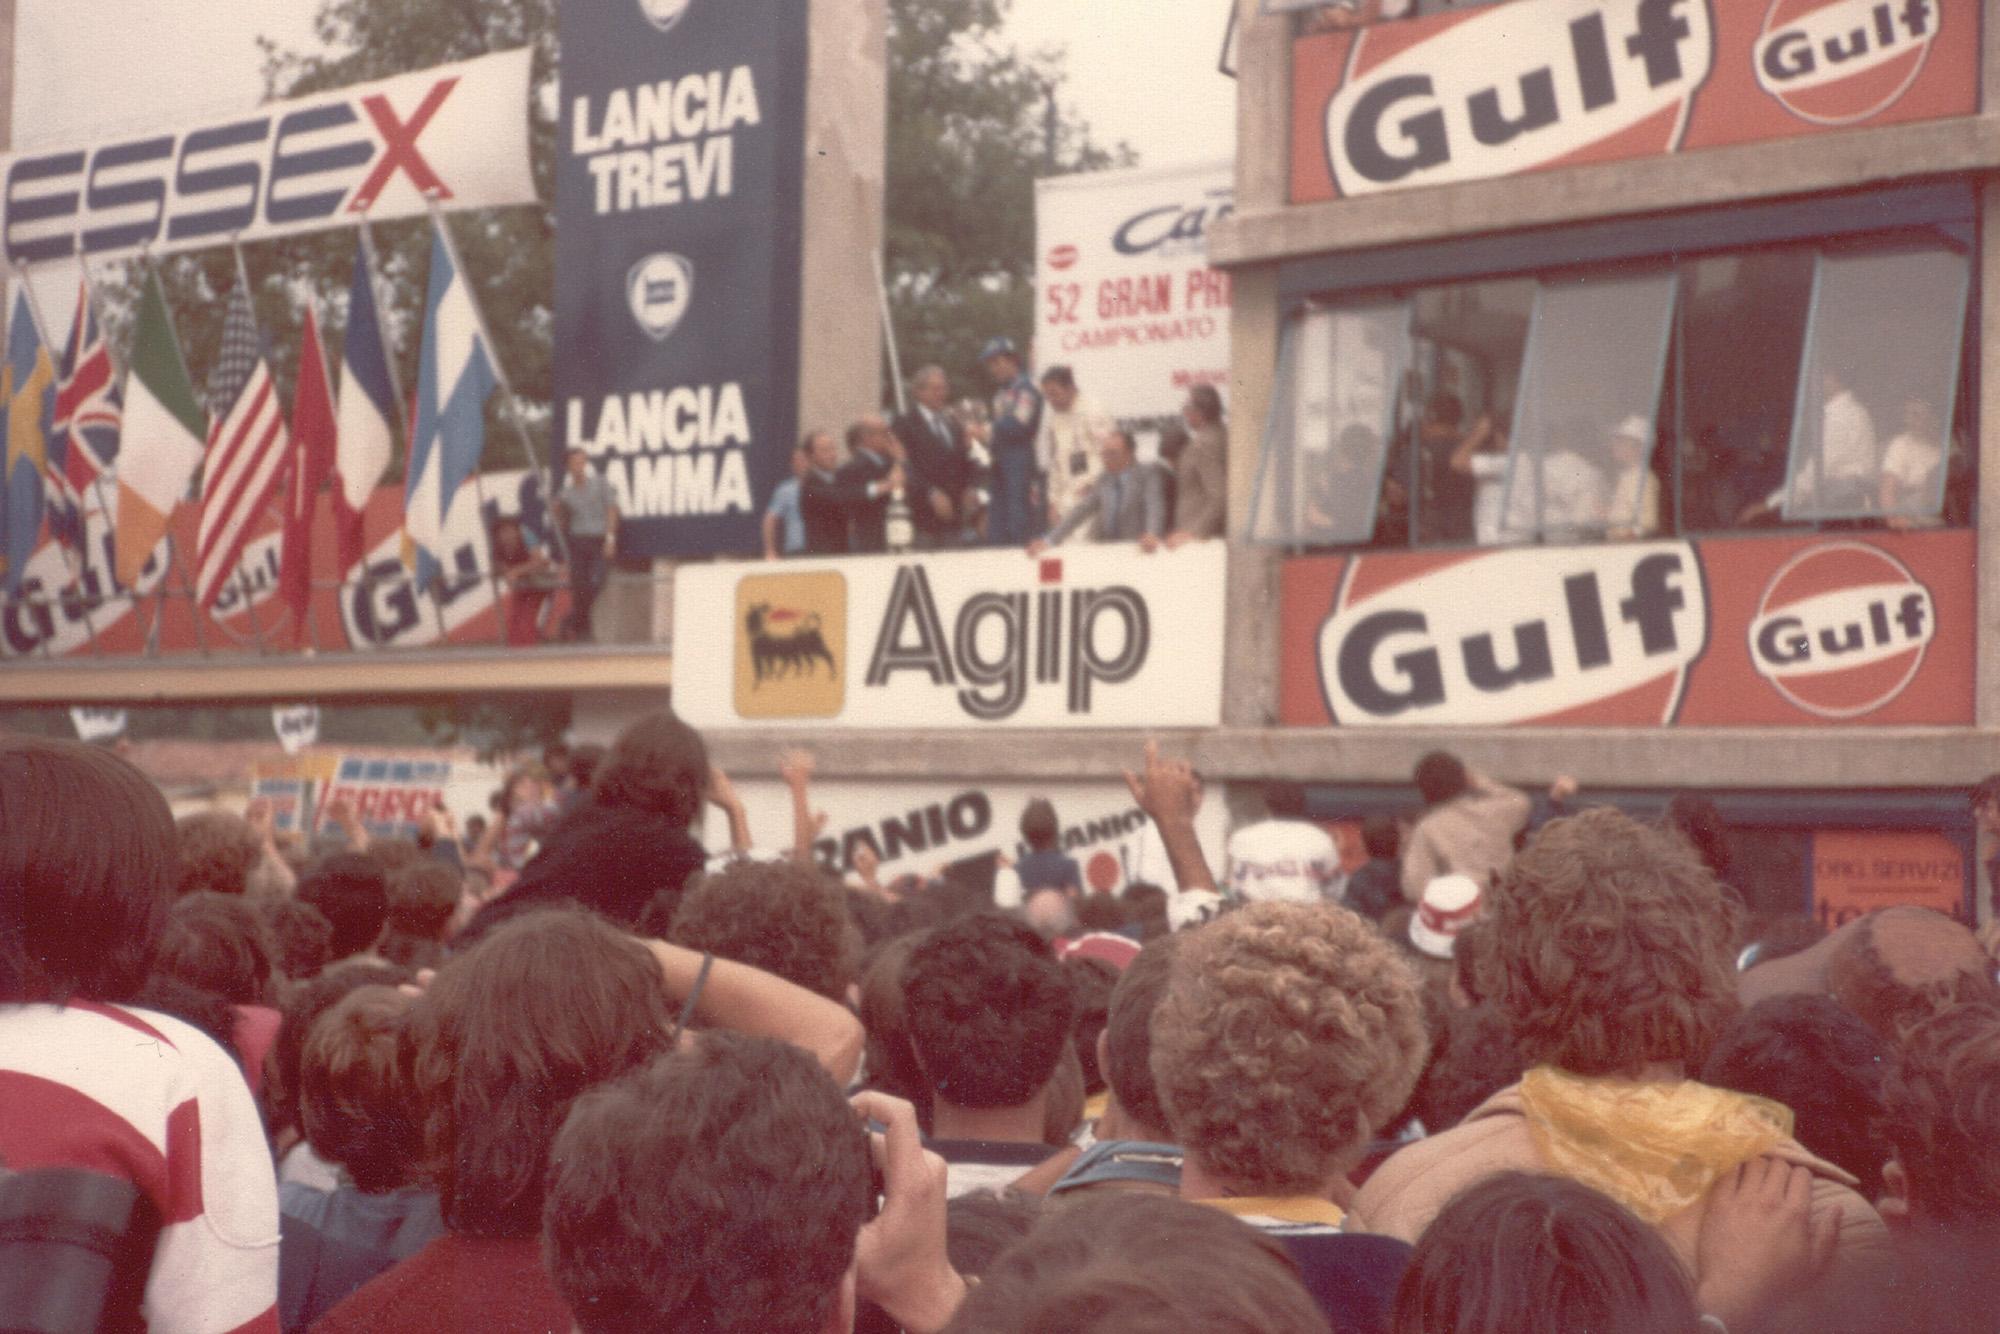 Alain Prost on the podium at the 1981 Italian GP